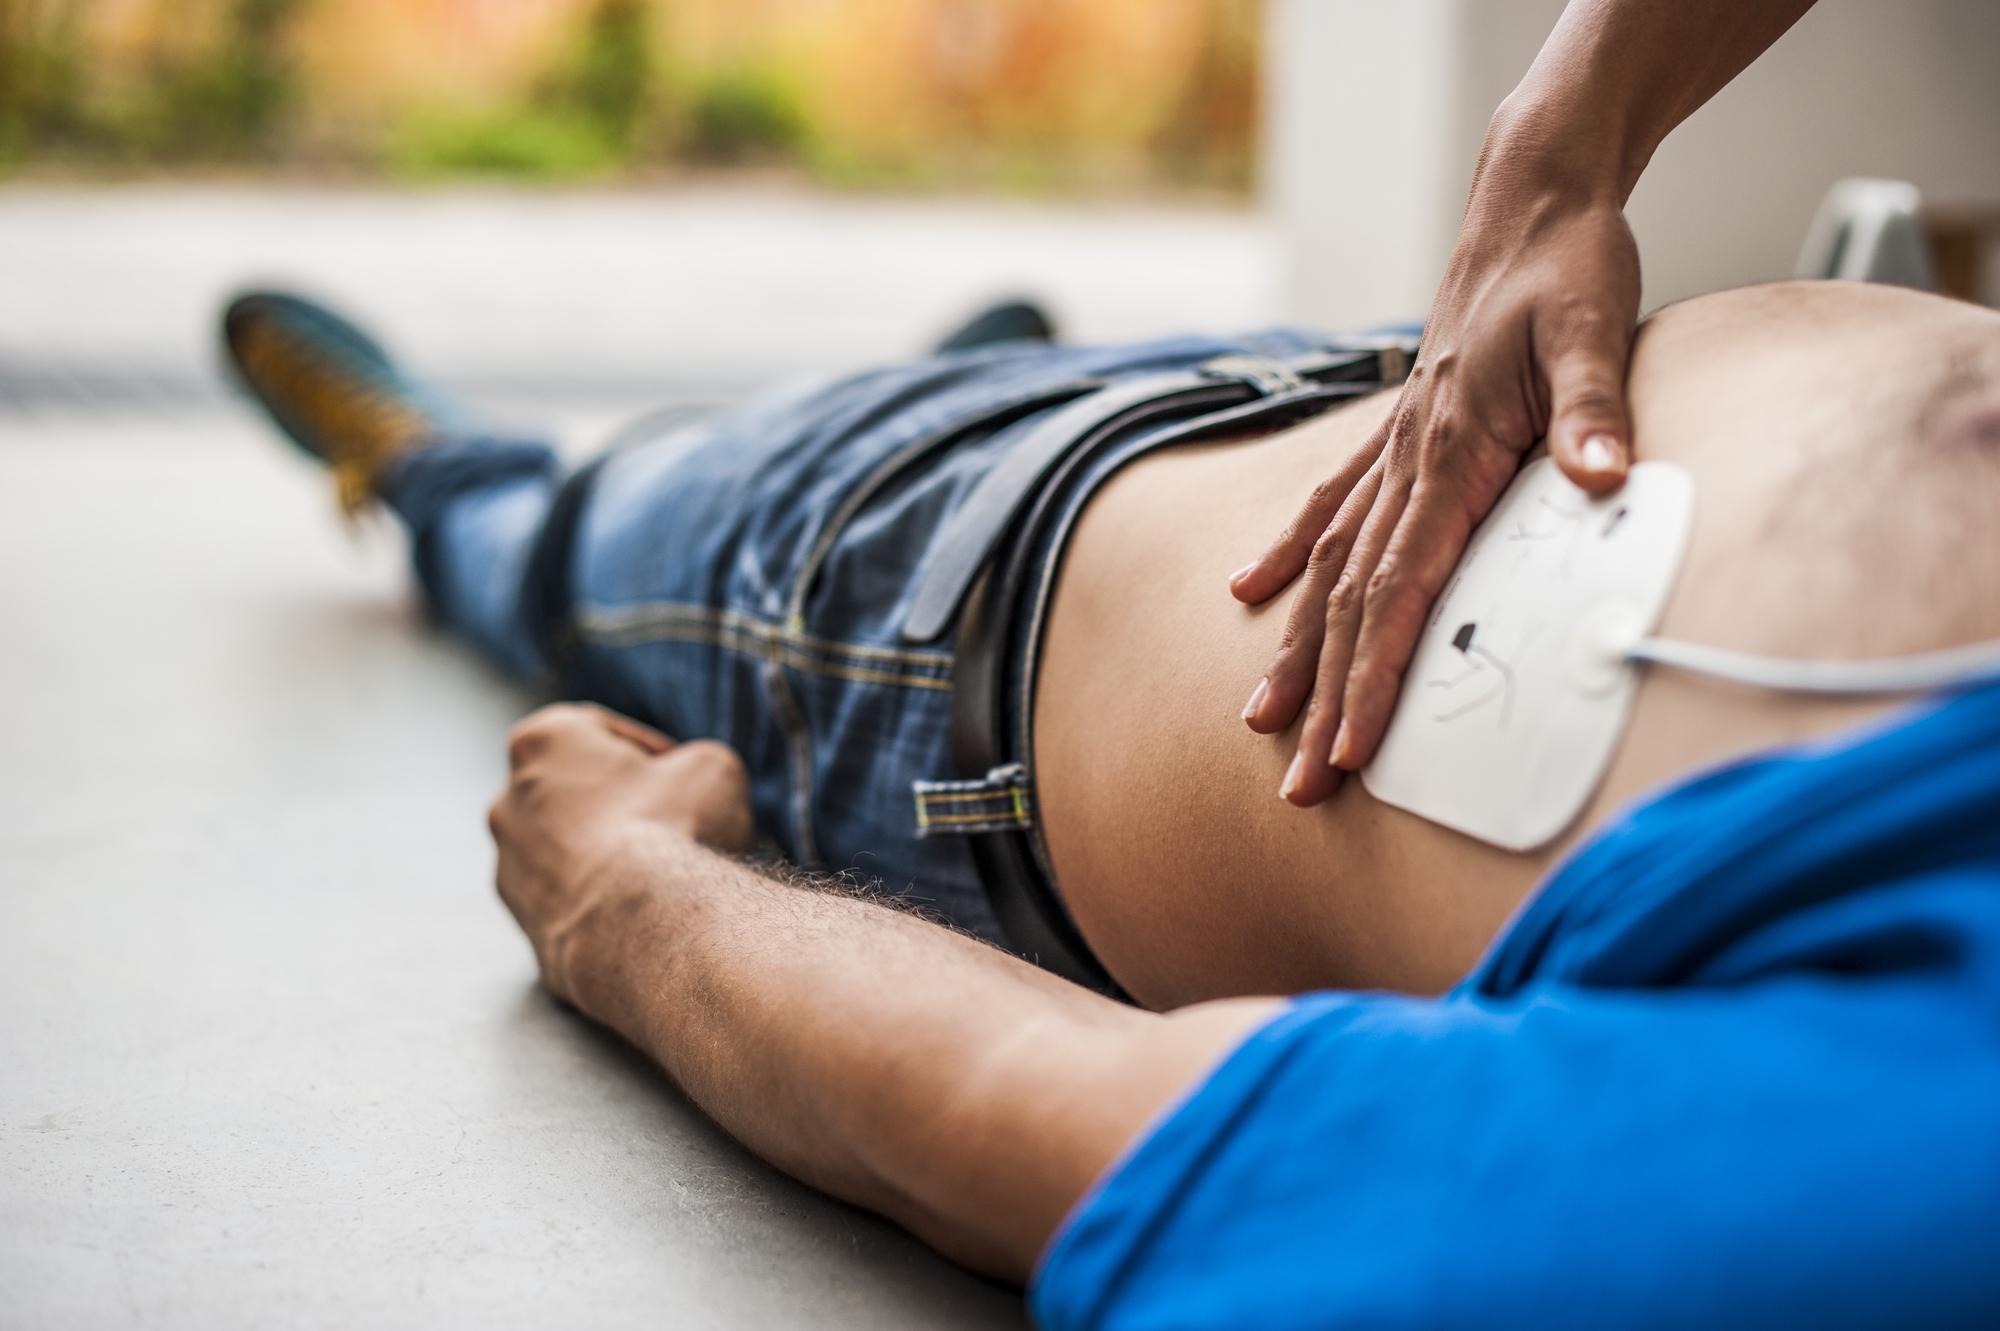 Cardiac Arrest Survival Rate